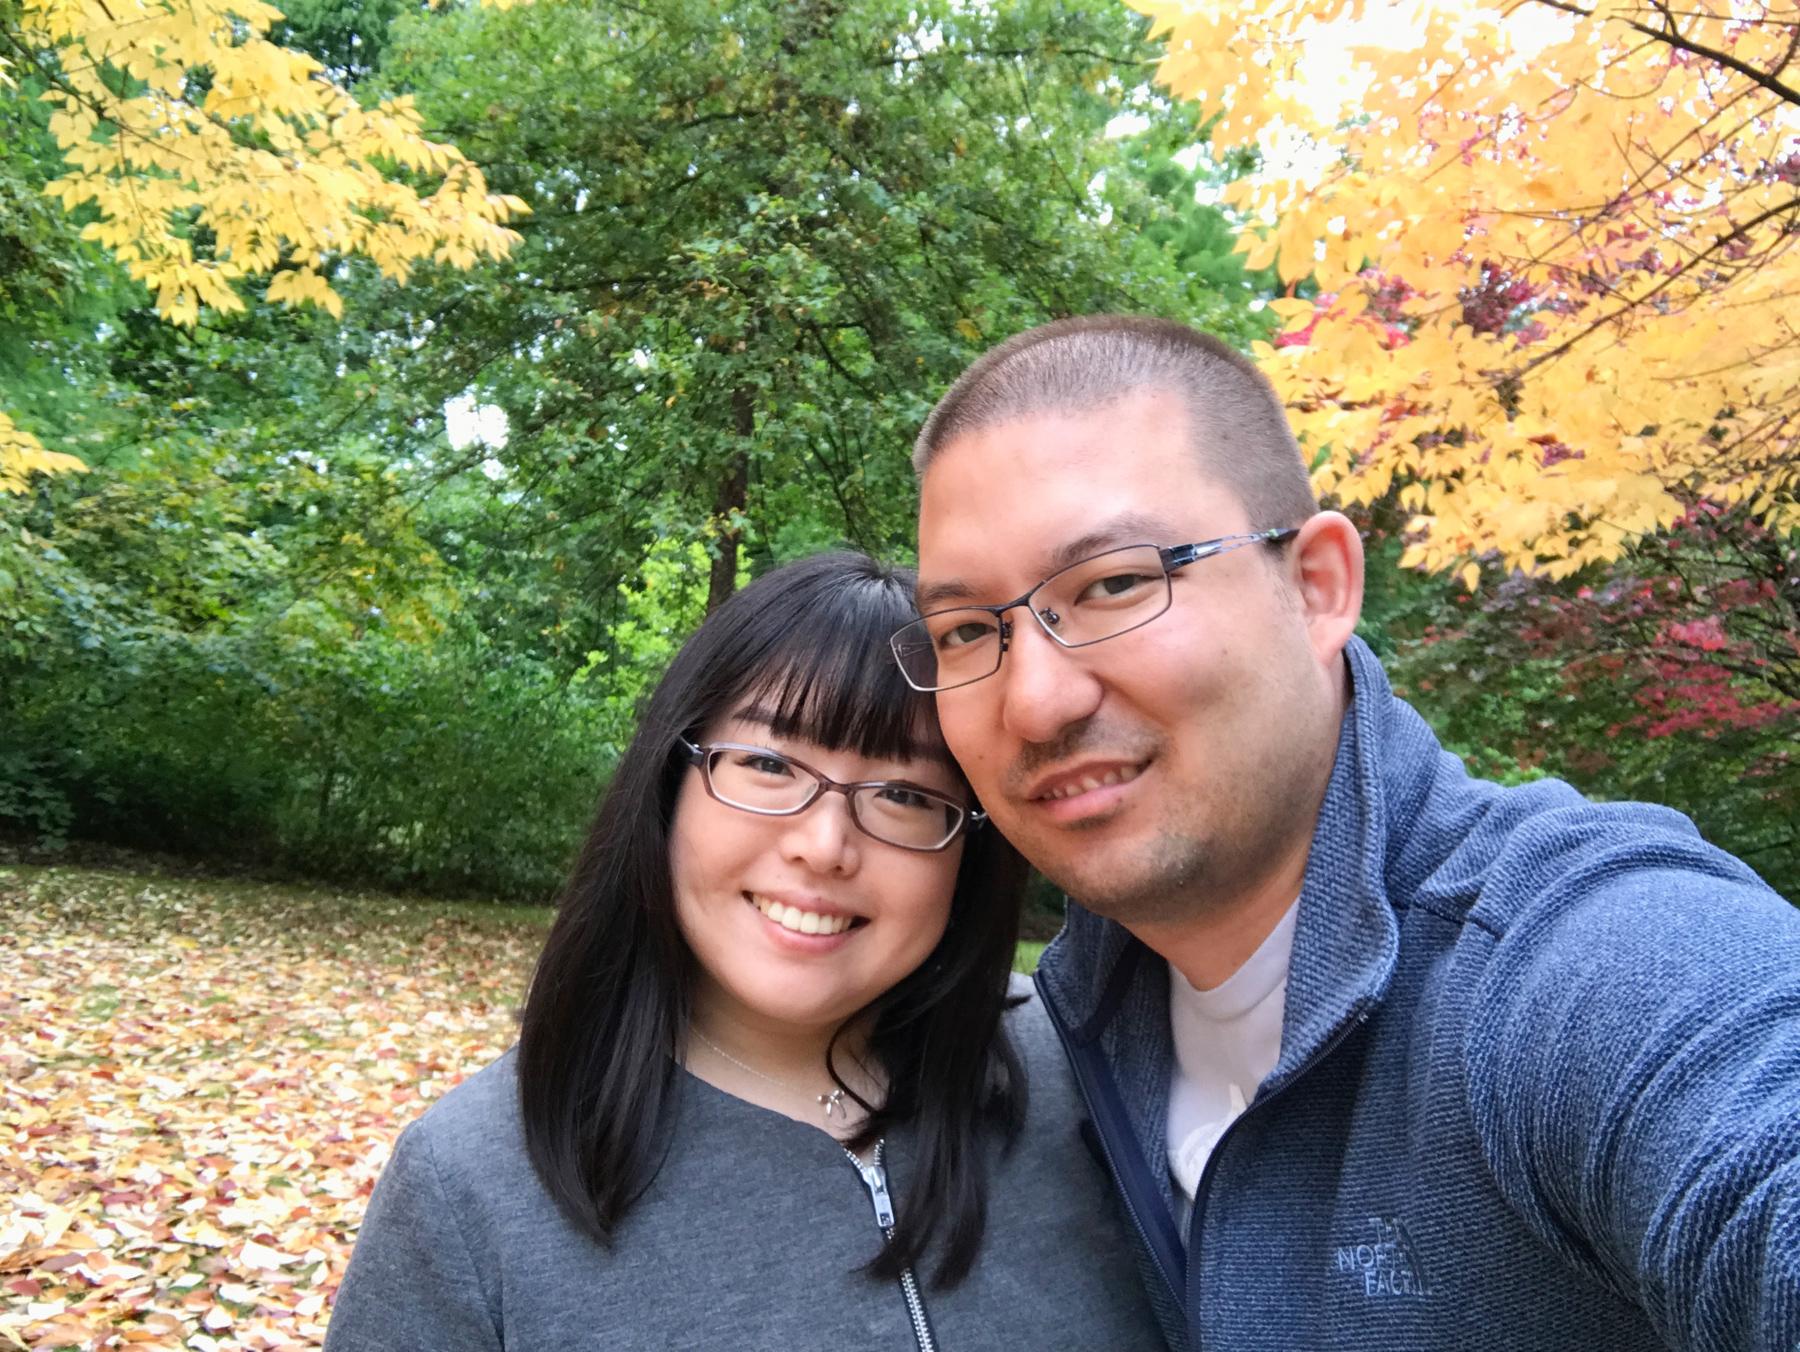 Us at VanDusen Botanical Garden